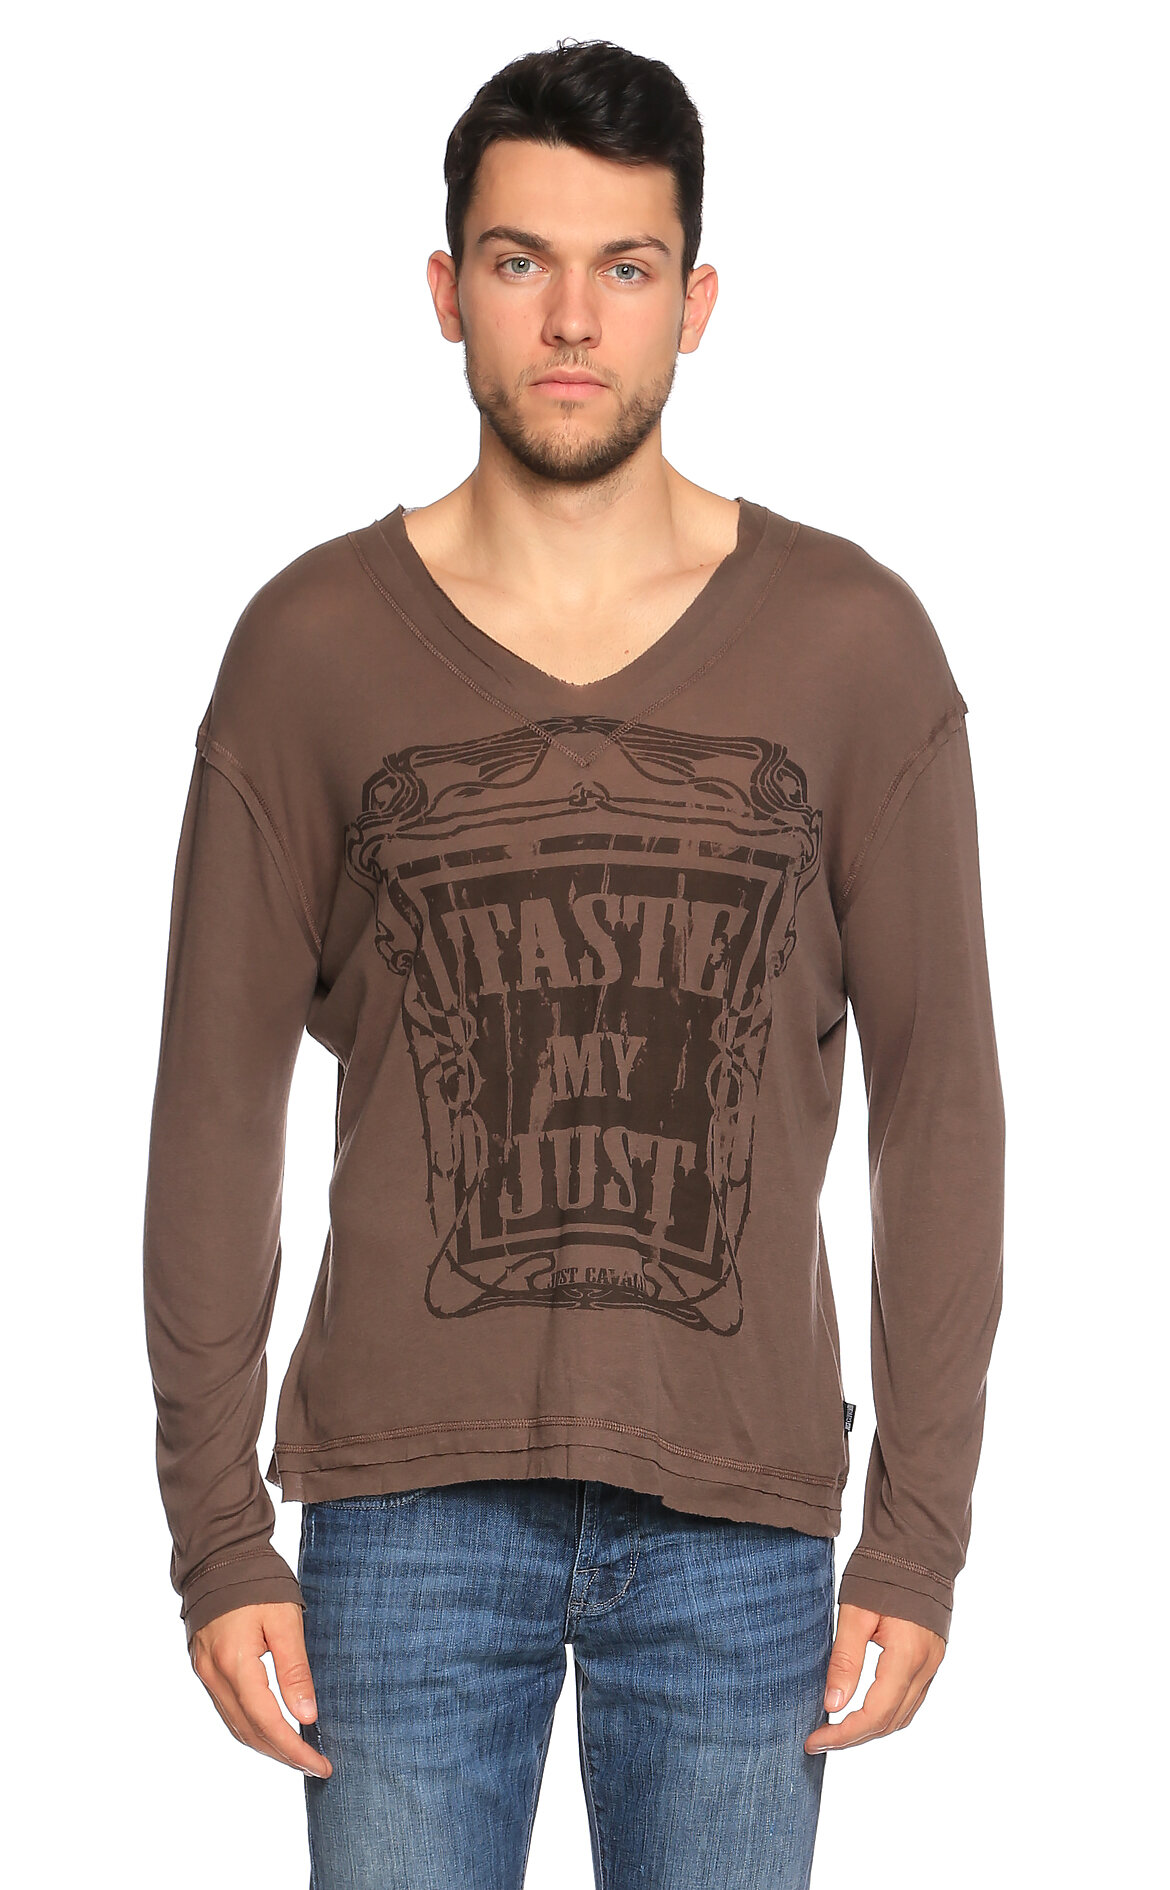 Just Cavalli-Just Cavalli V Yaka Uzun Kollu Kahverengi T-Shirt